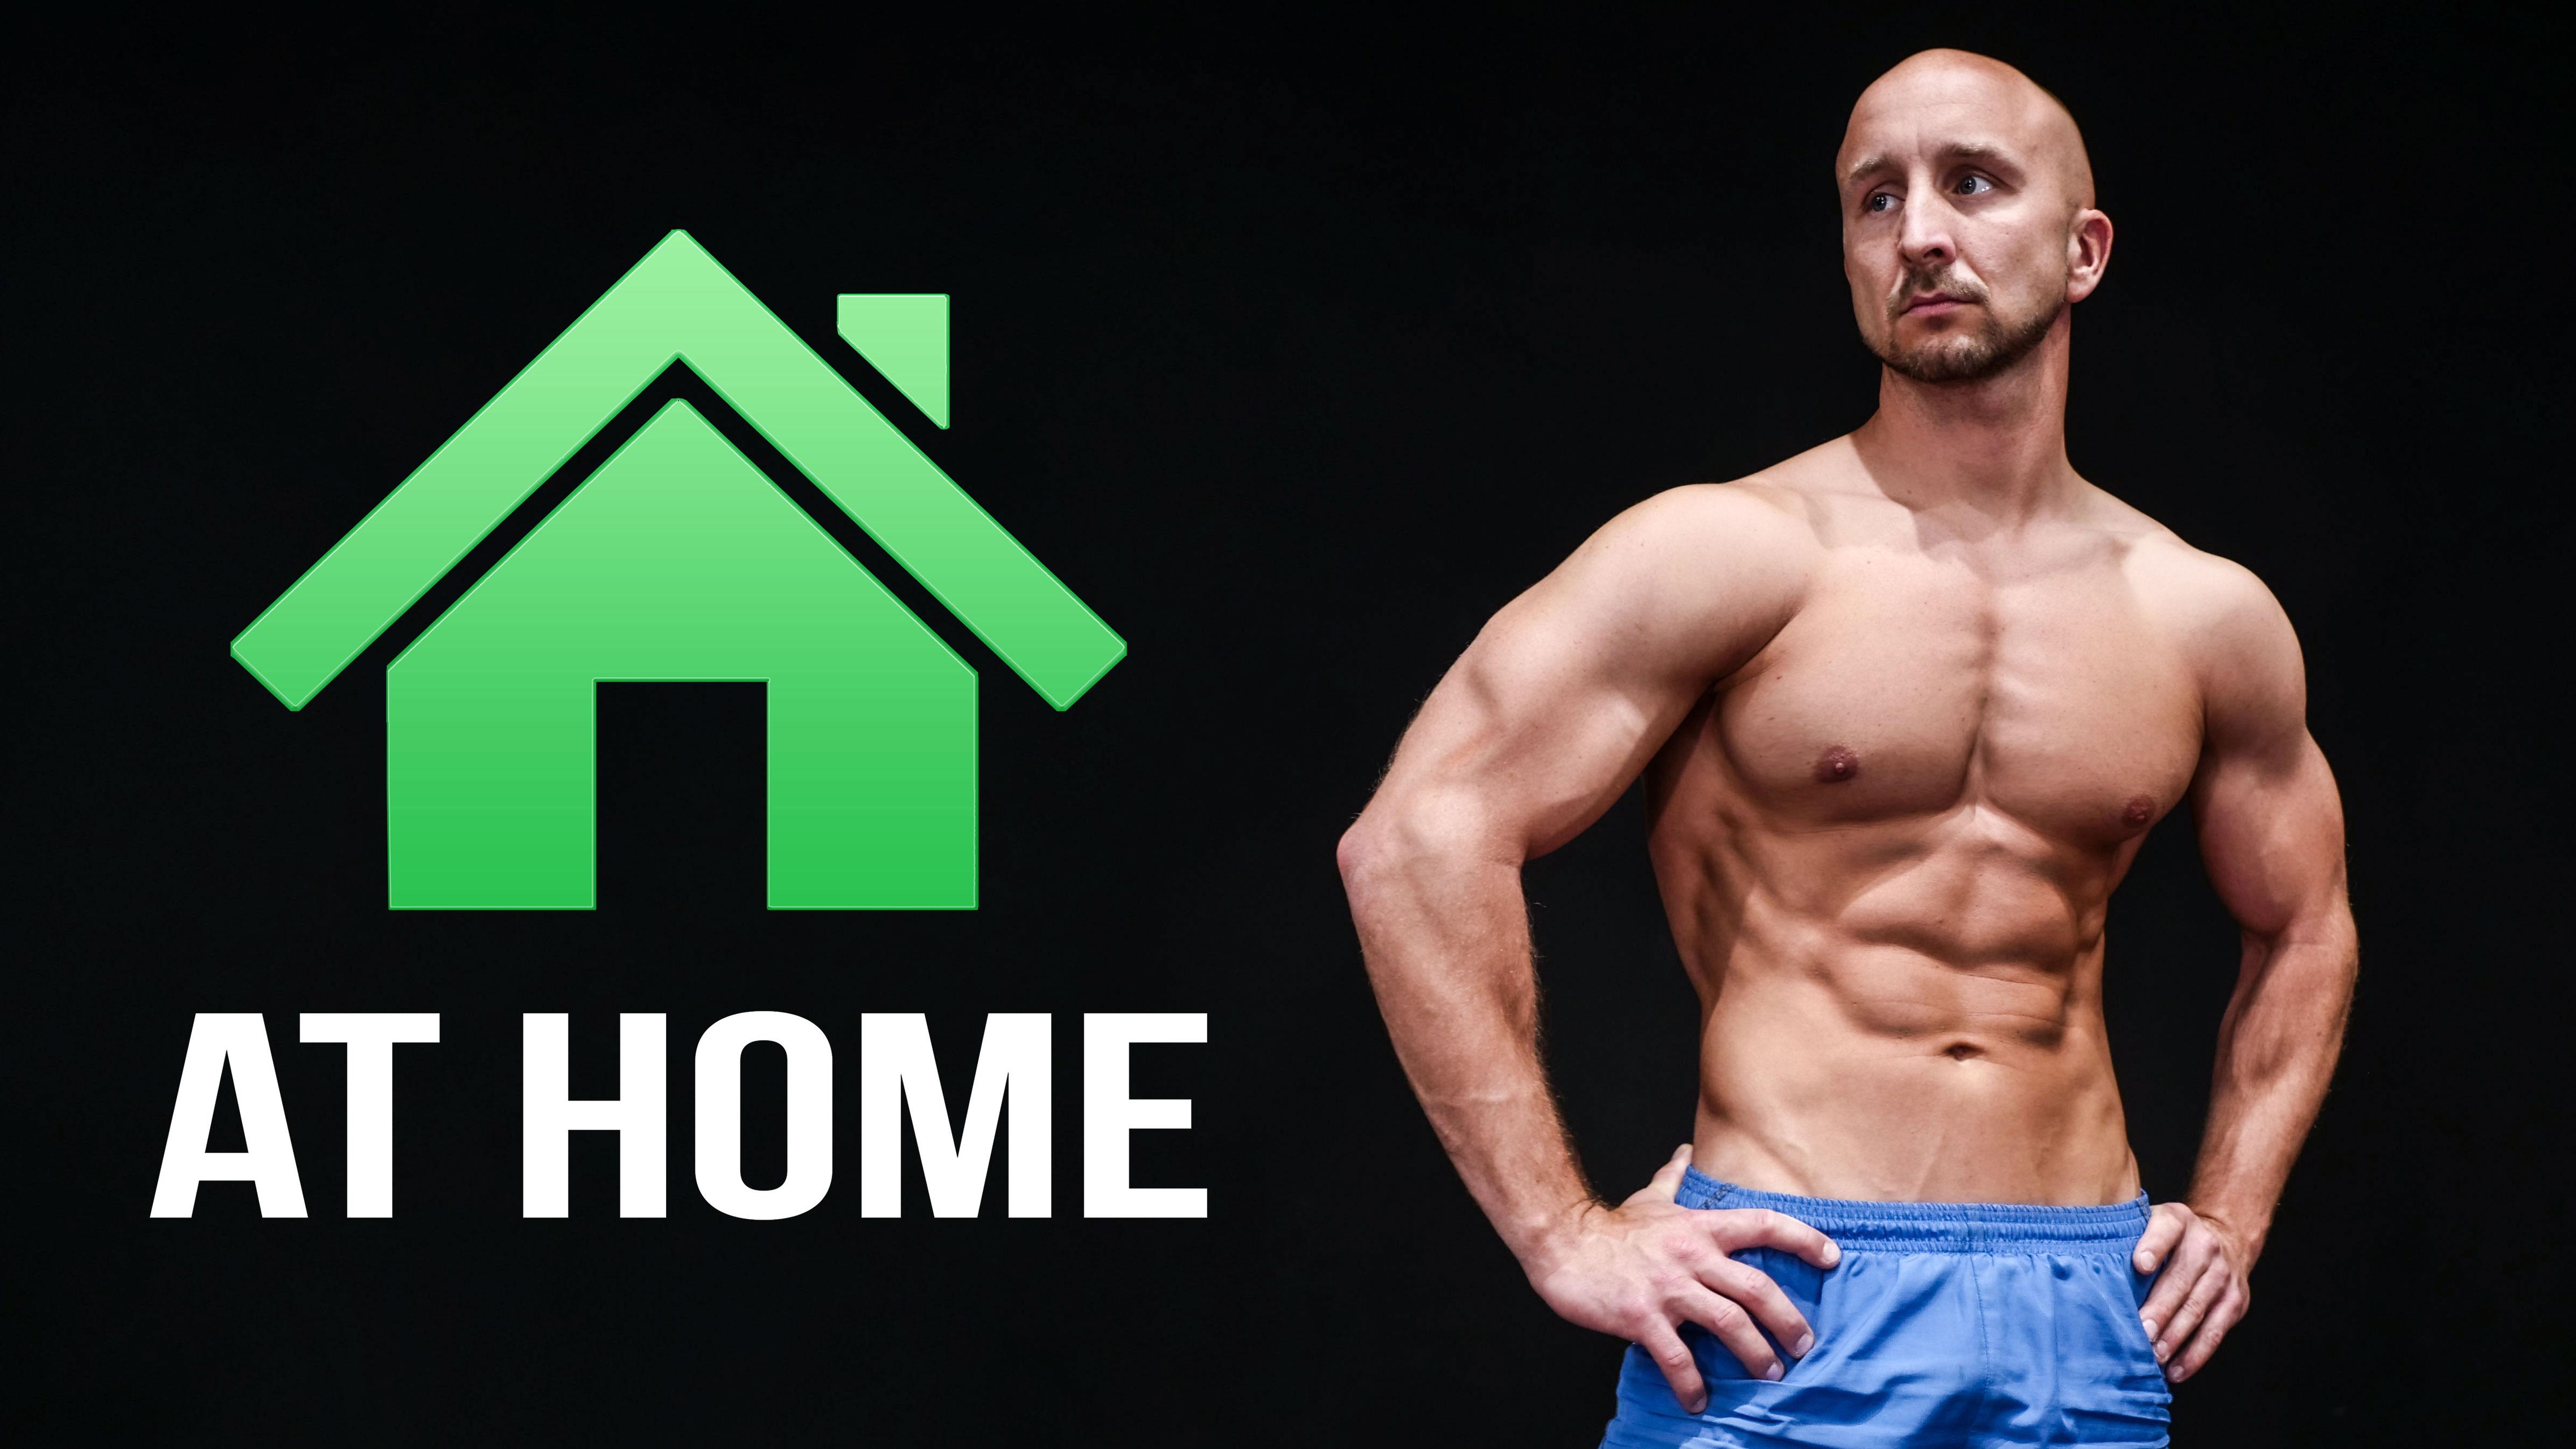 Home Workout Cali Move